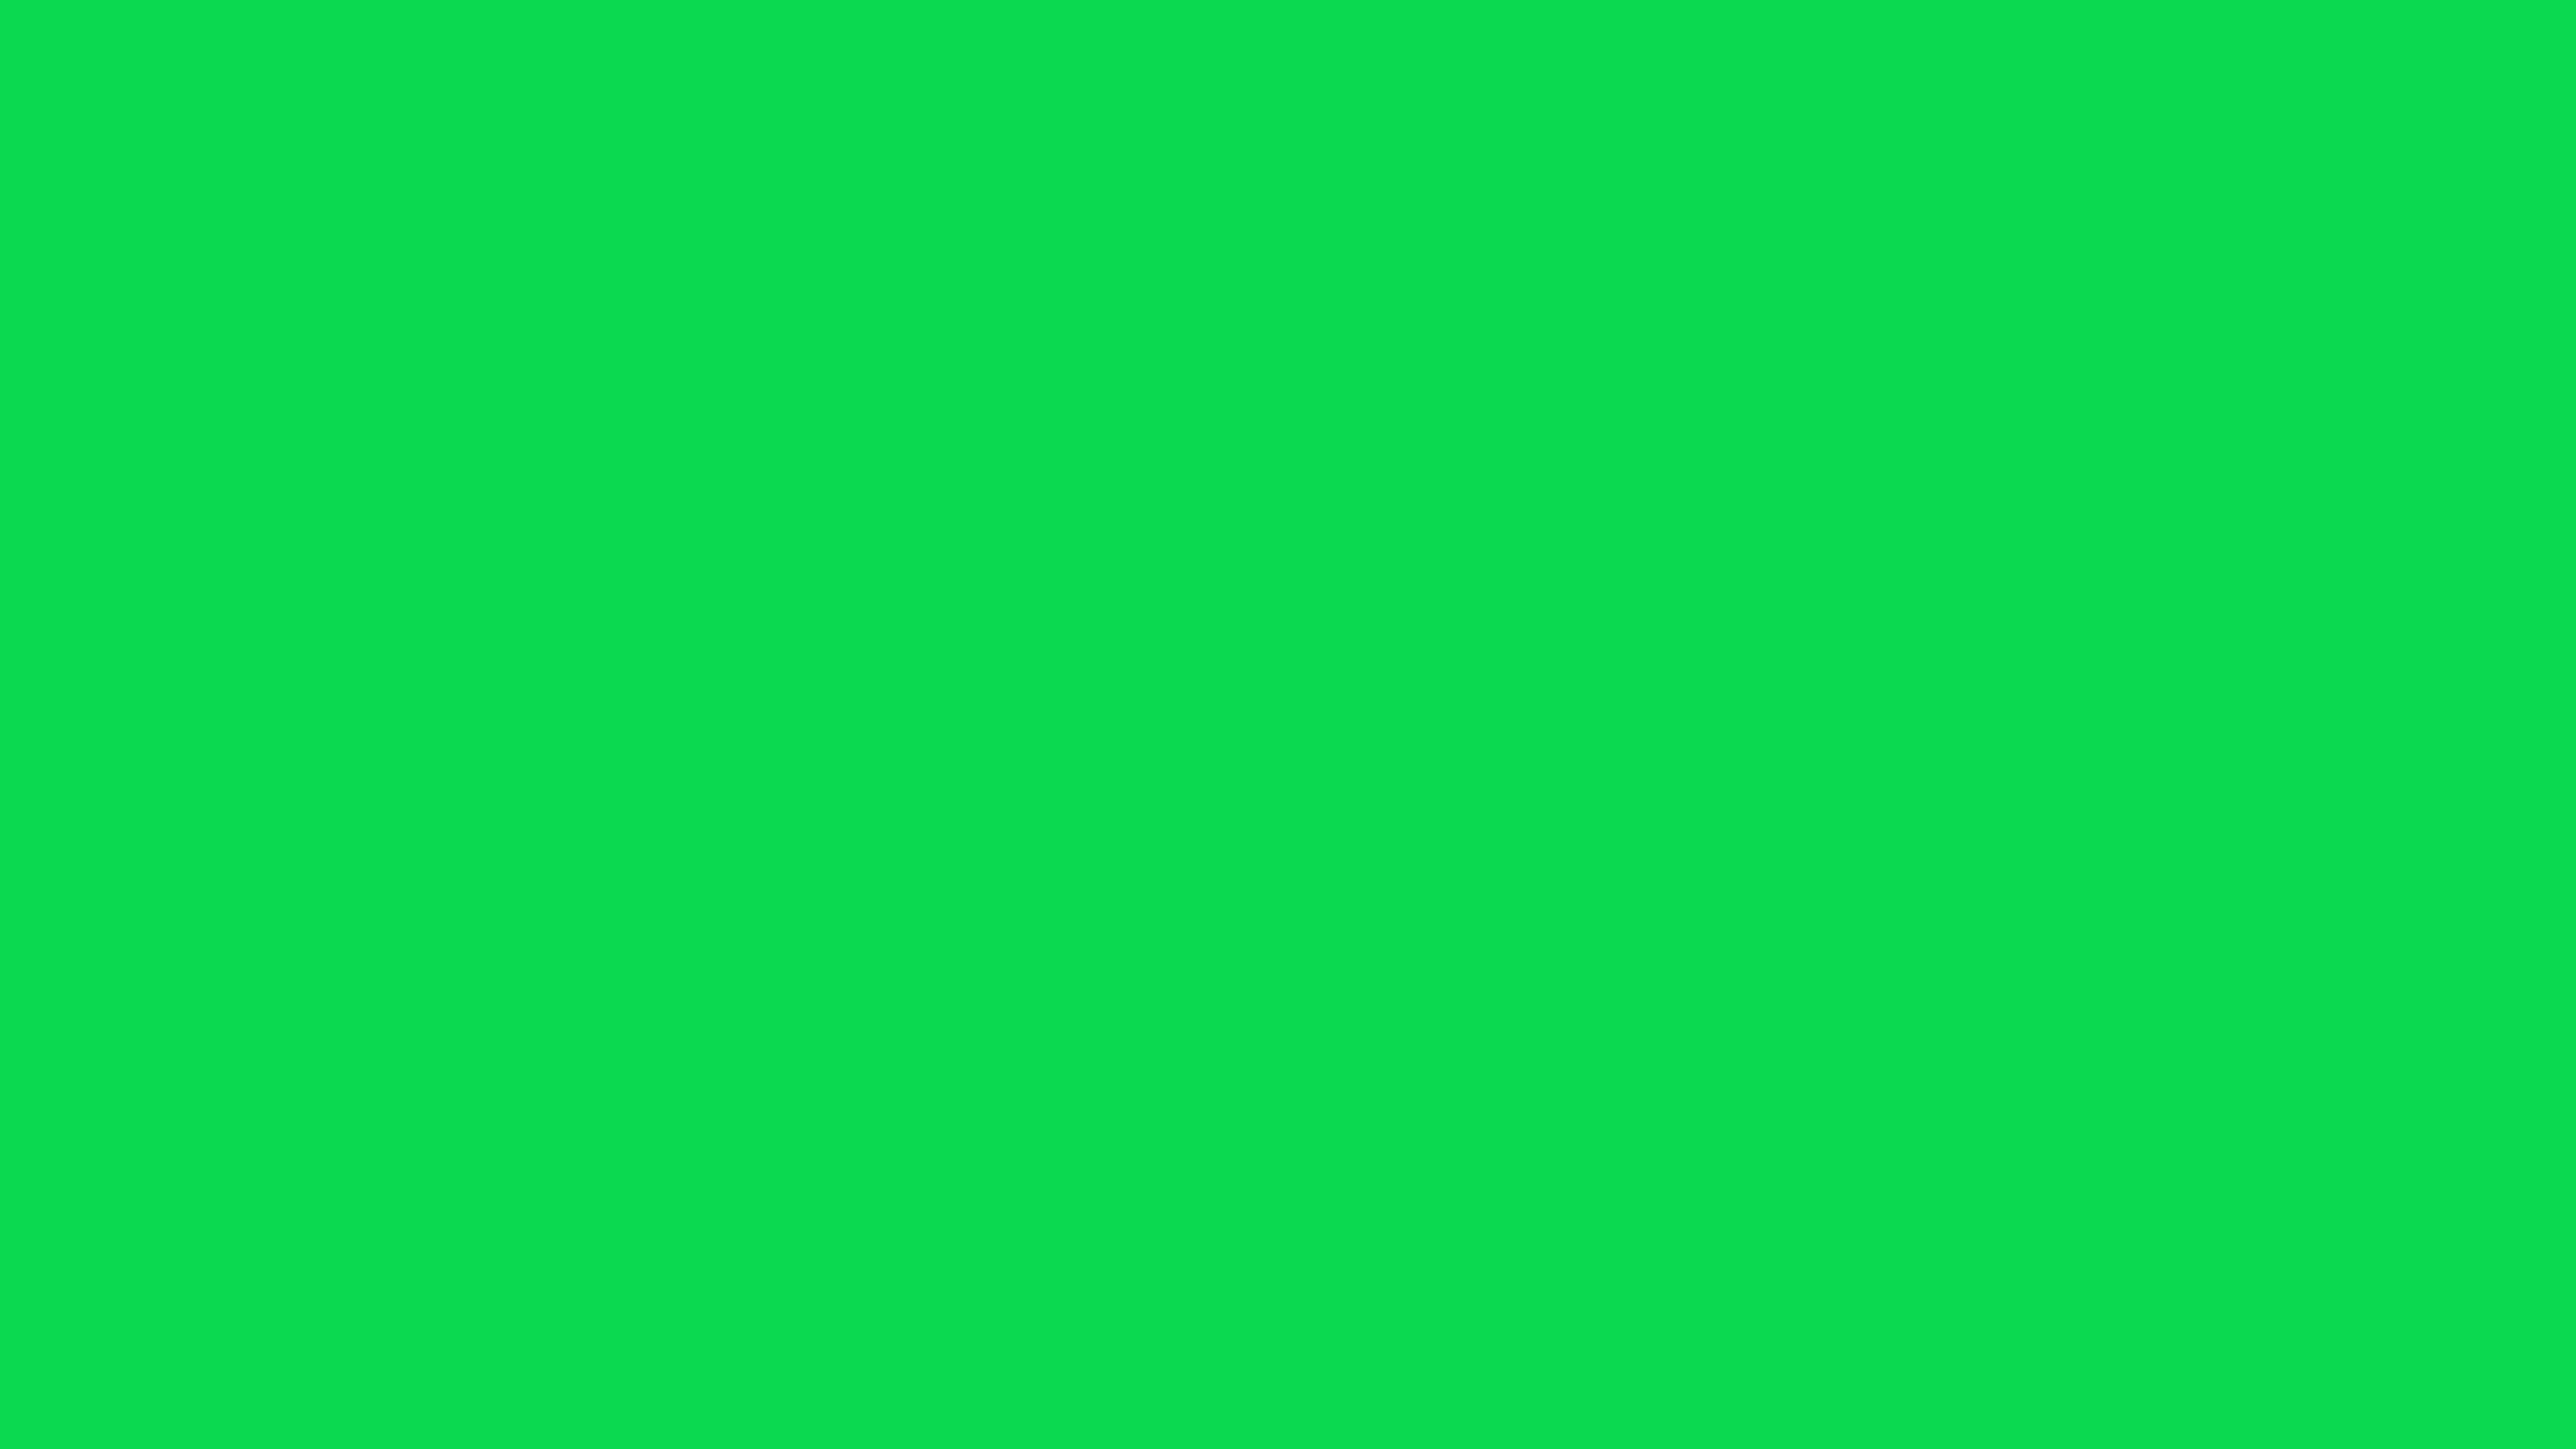 4096x2304 Malachite Solid Color Background